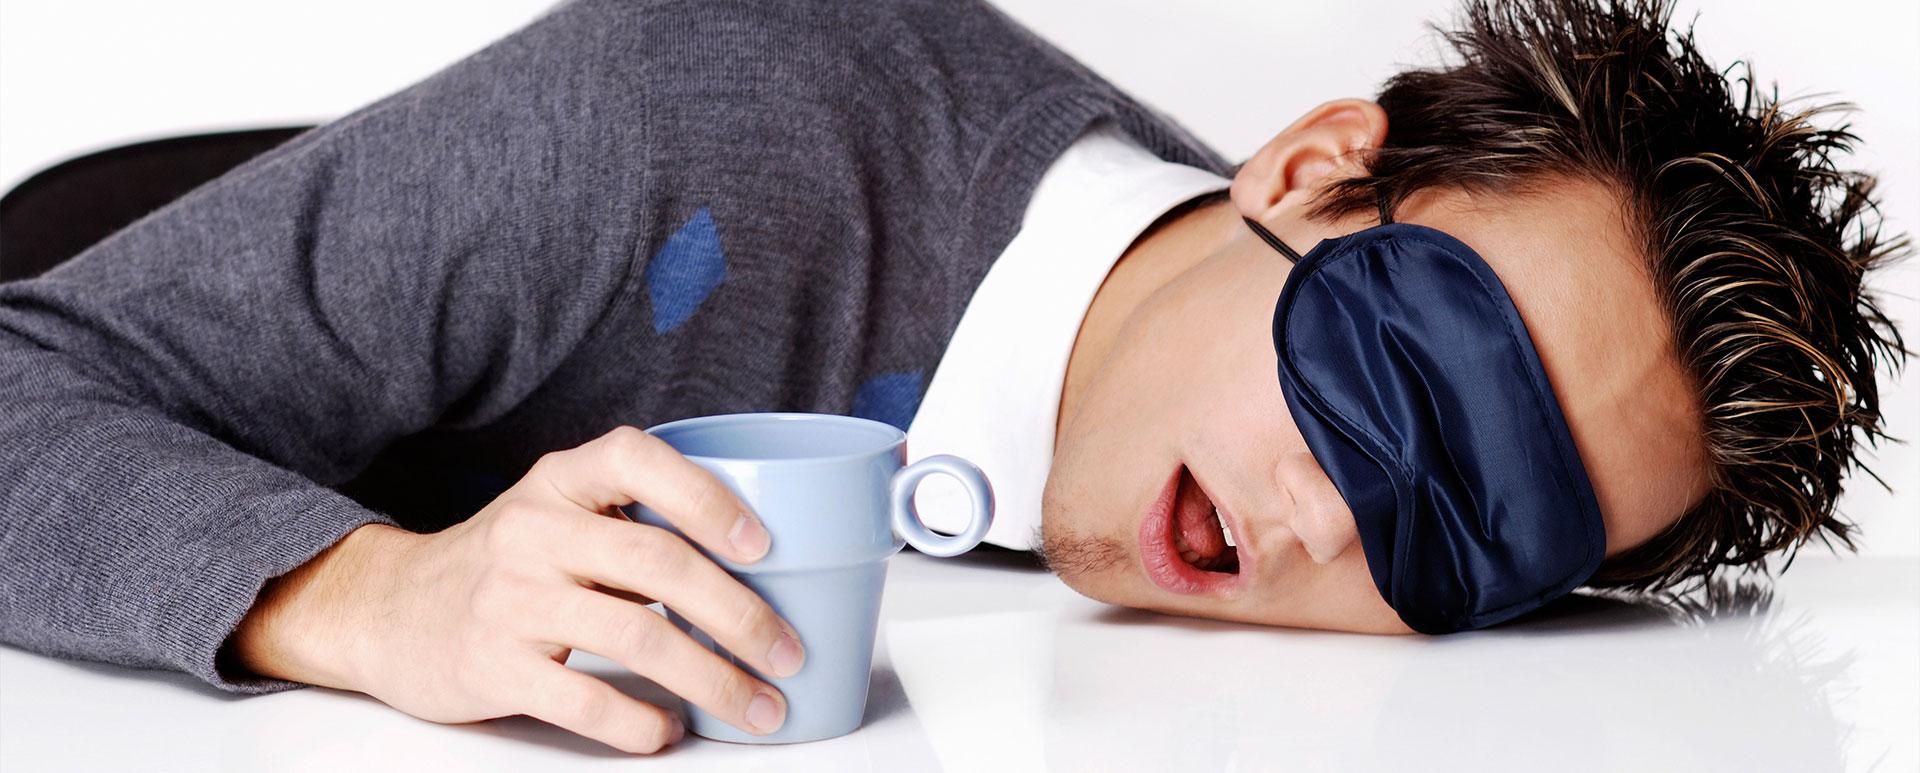 Healing Hands Health Center - Sleep Hacks